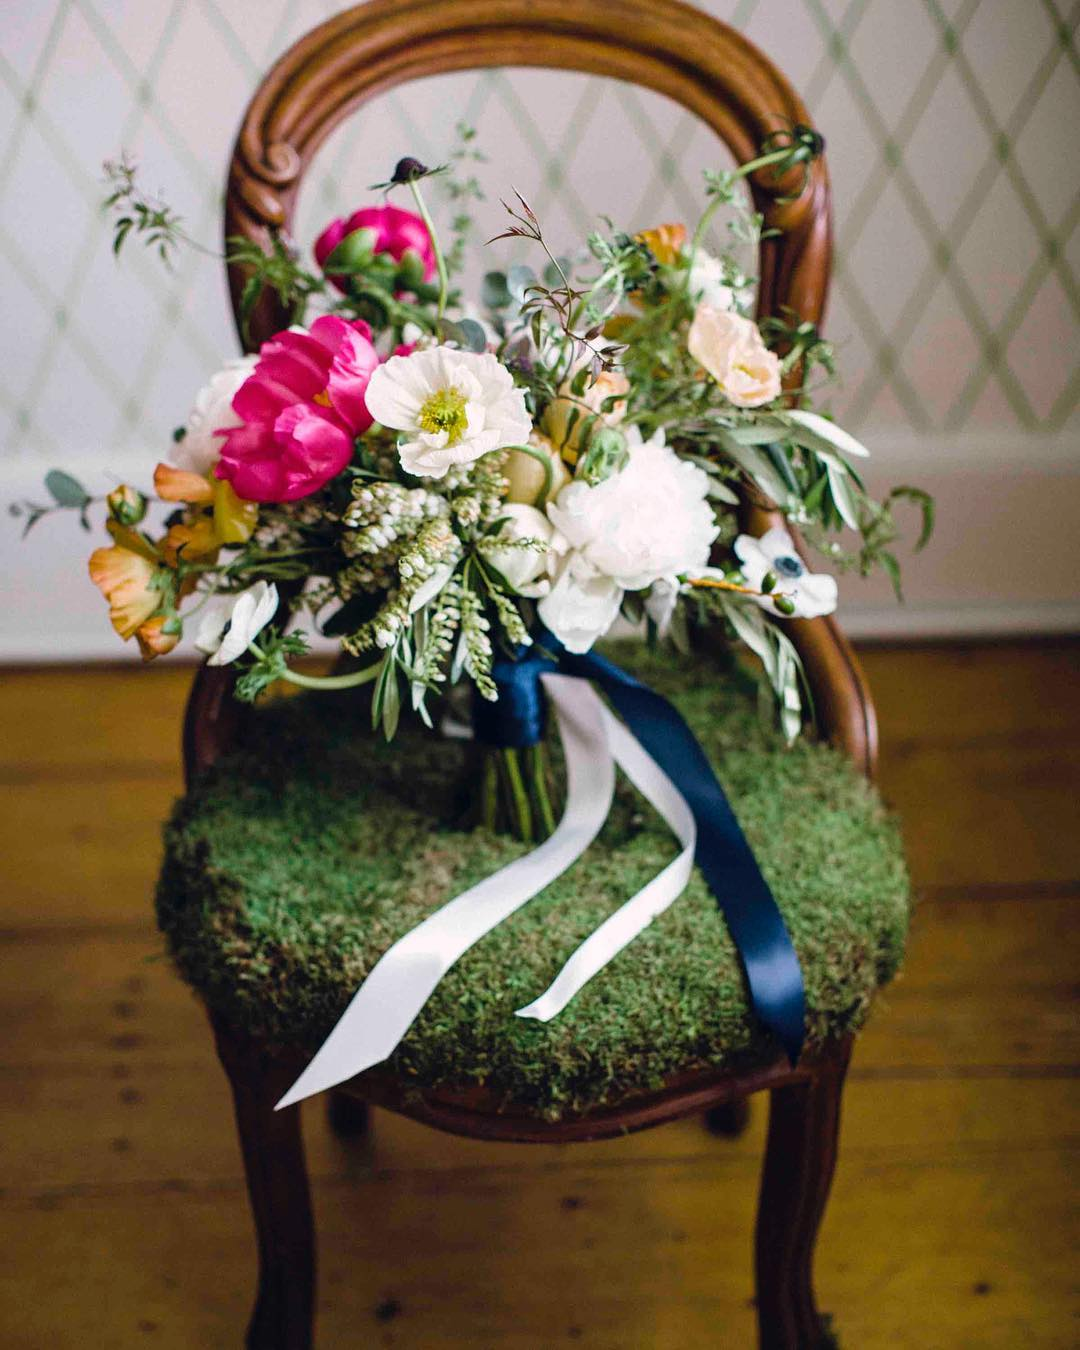 {bouquet on moss chair} photo | @kate_preftakes . . . #stilllife #portrait #flowerart #organicart #bouquet #floralart #brideflowers #prettyflowers #weddingflowers #lovely #lotusfloraldesigns #weddingflorist #love